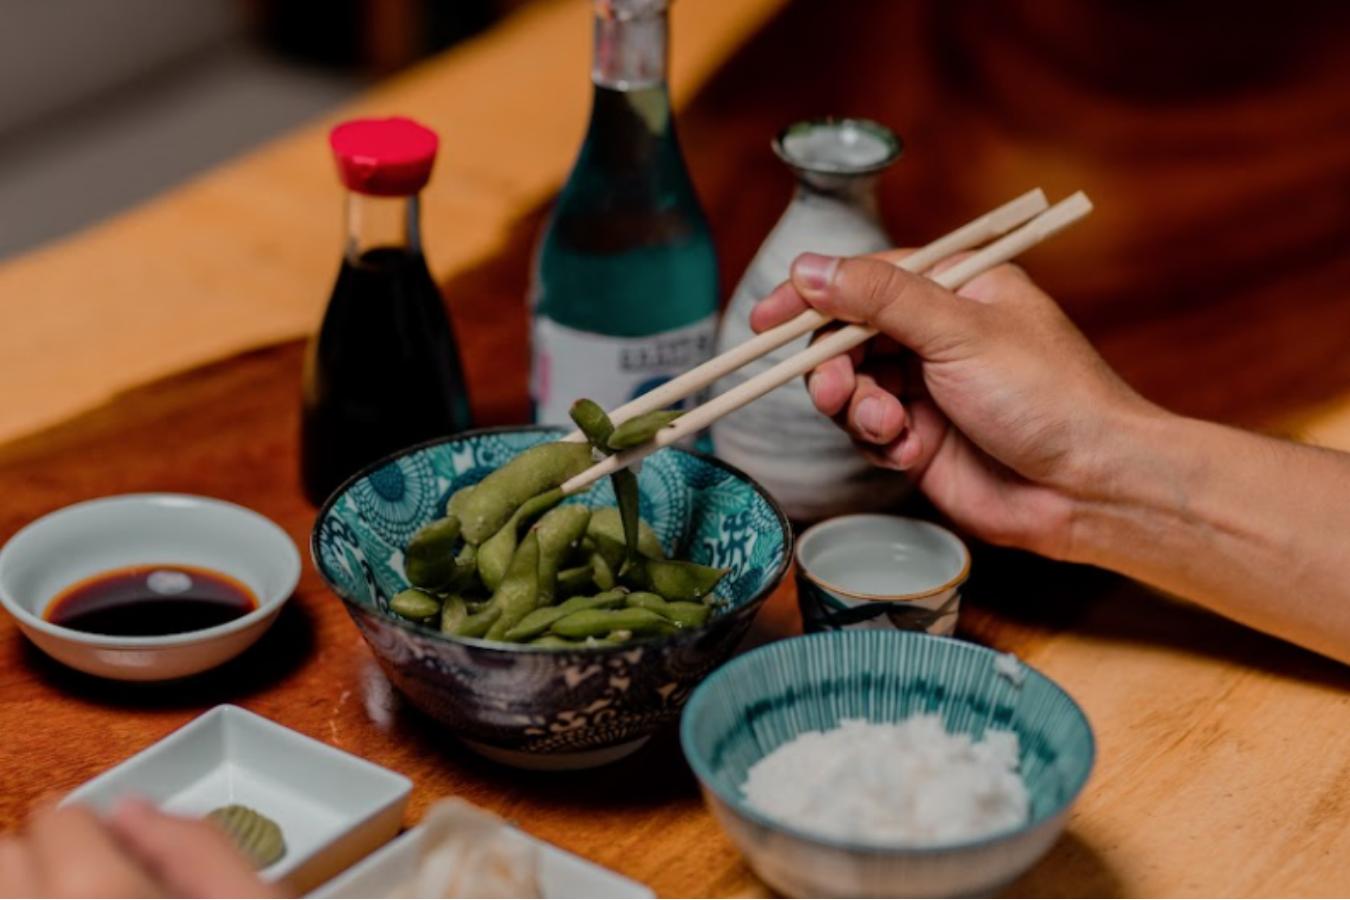 restaurante comida japonesa, edamames